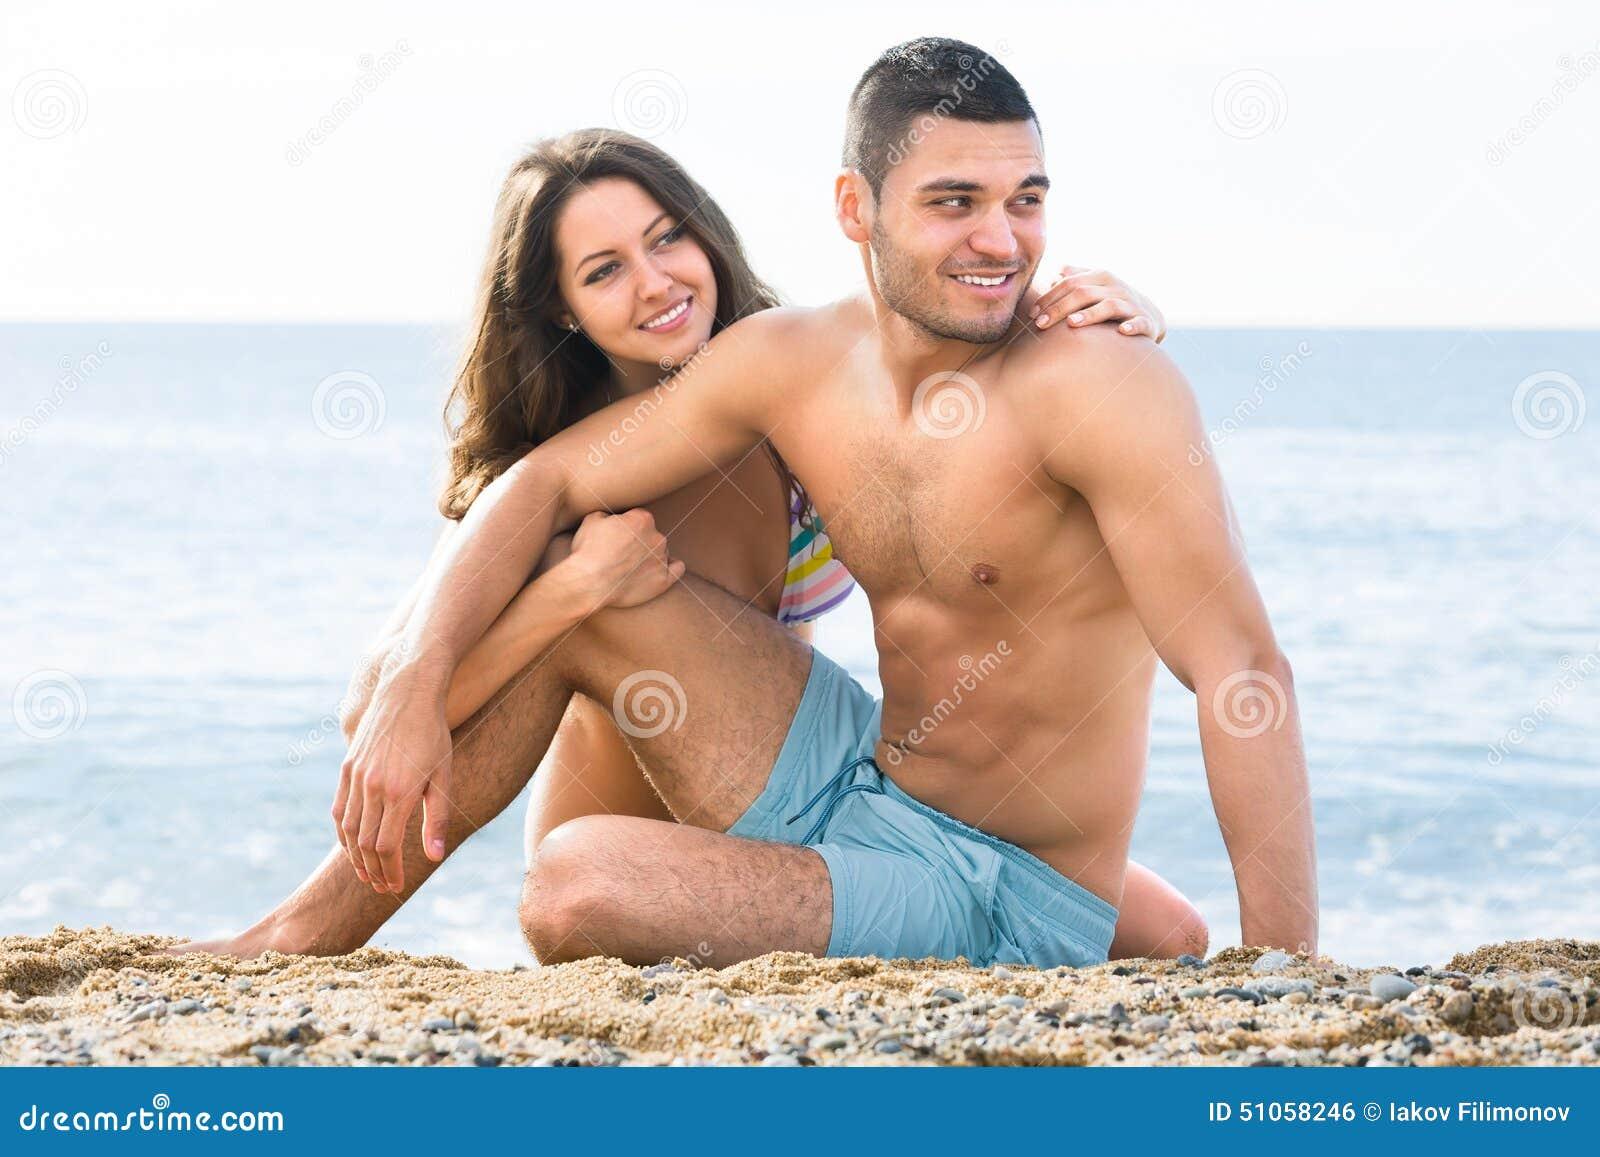 dream interpretation dating a younger man